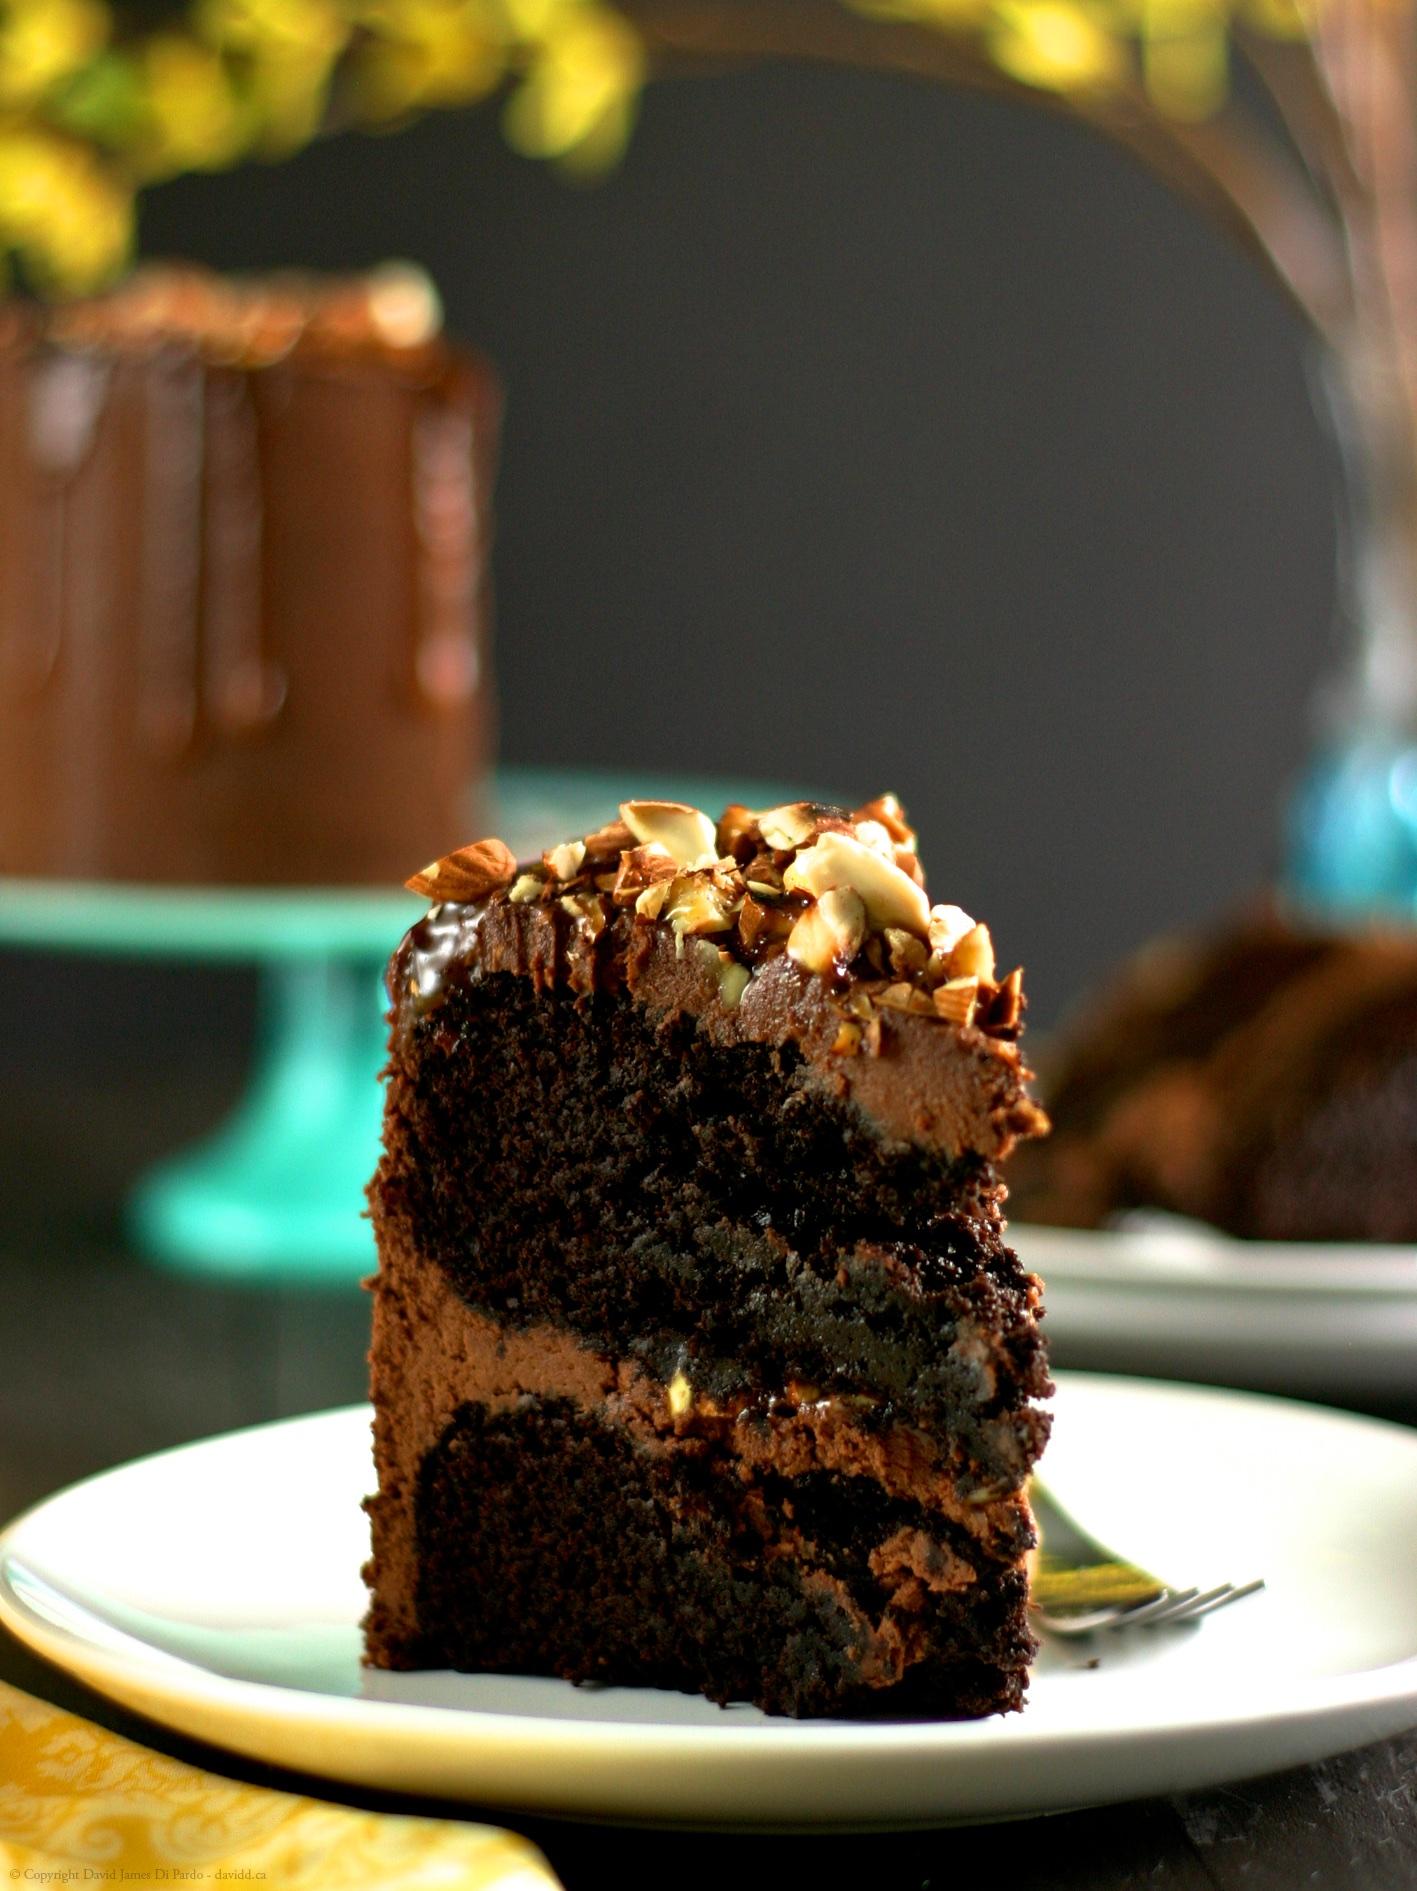 Vegan Gluten-Free Salted Almond Chocolate Cake